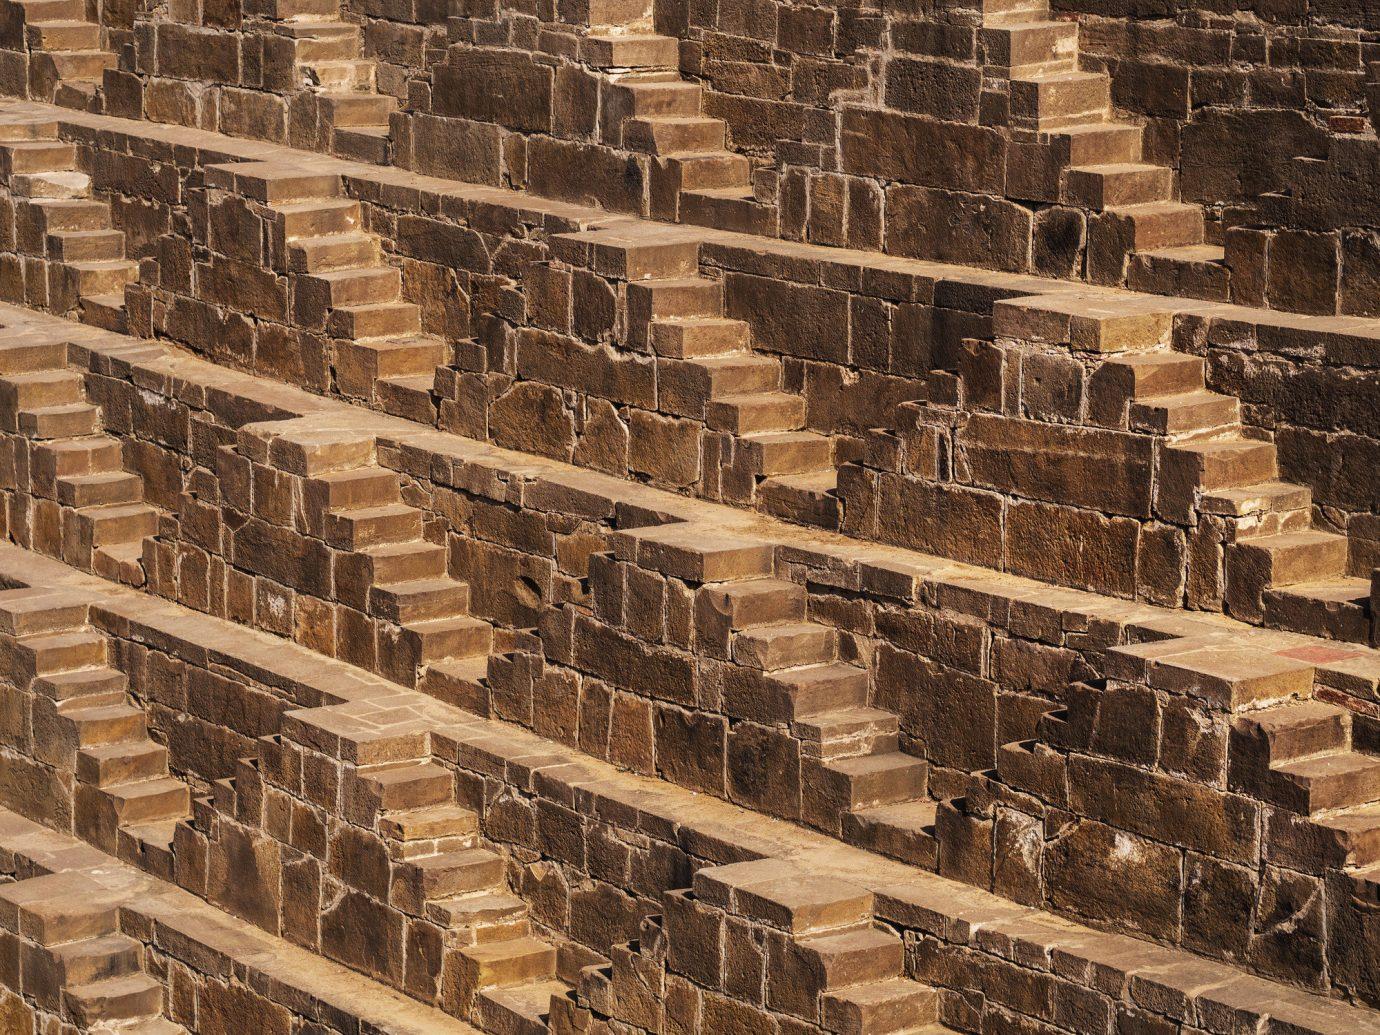 India Jaipur Jodhpur Trip Ideas outdoor light wall building archaeological site material brick ancient history stone wall brickwork basement building material